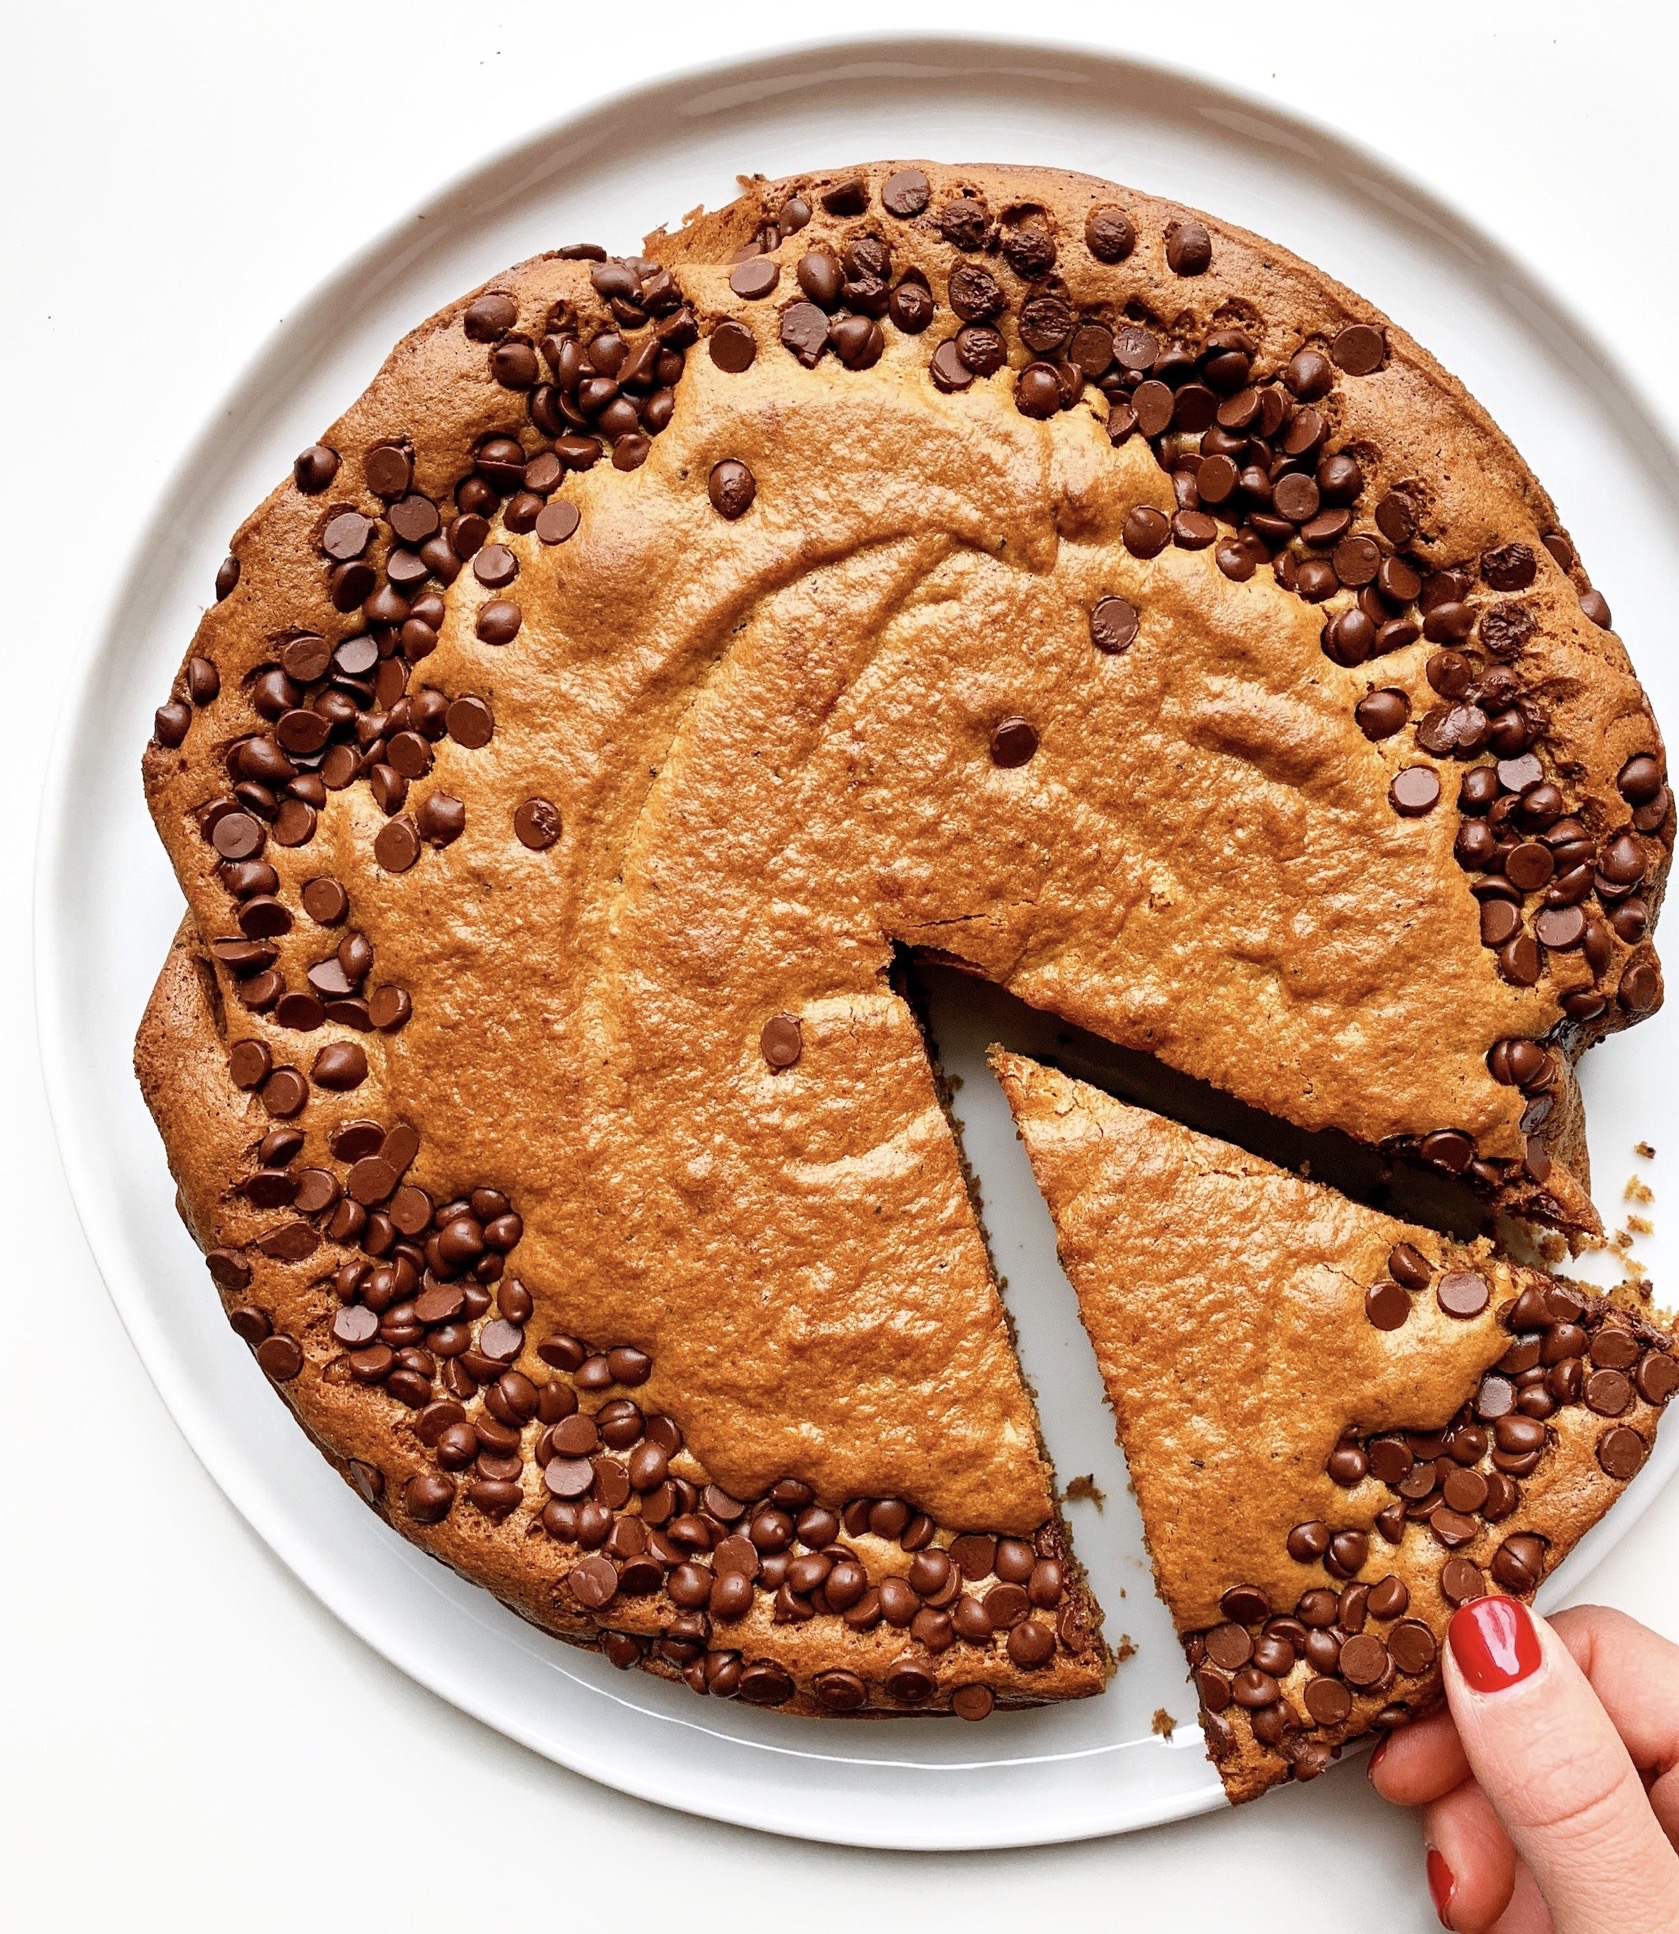 Giant Gluten Free Coffee Cookie Cake